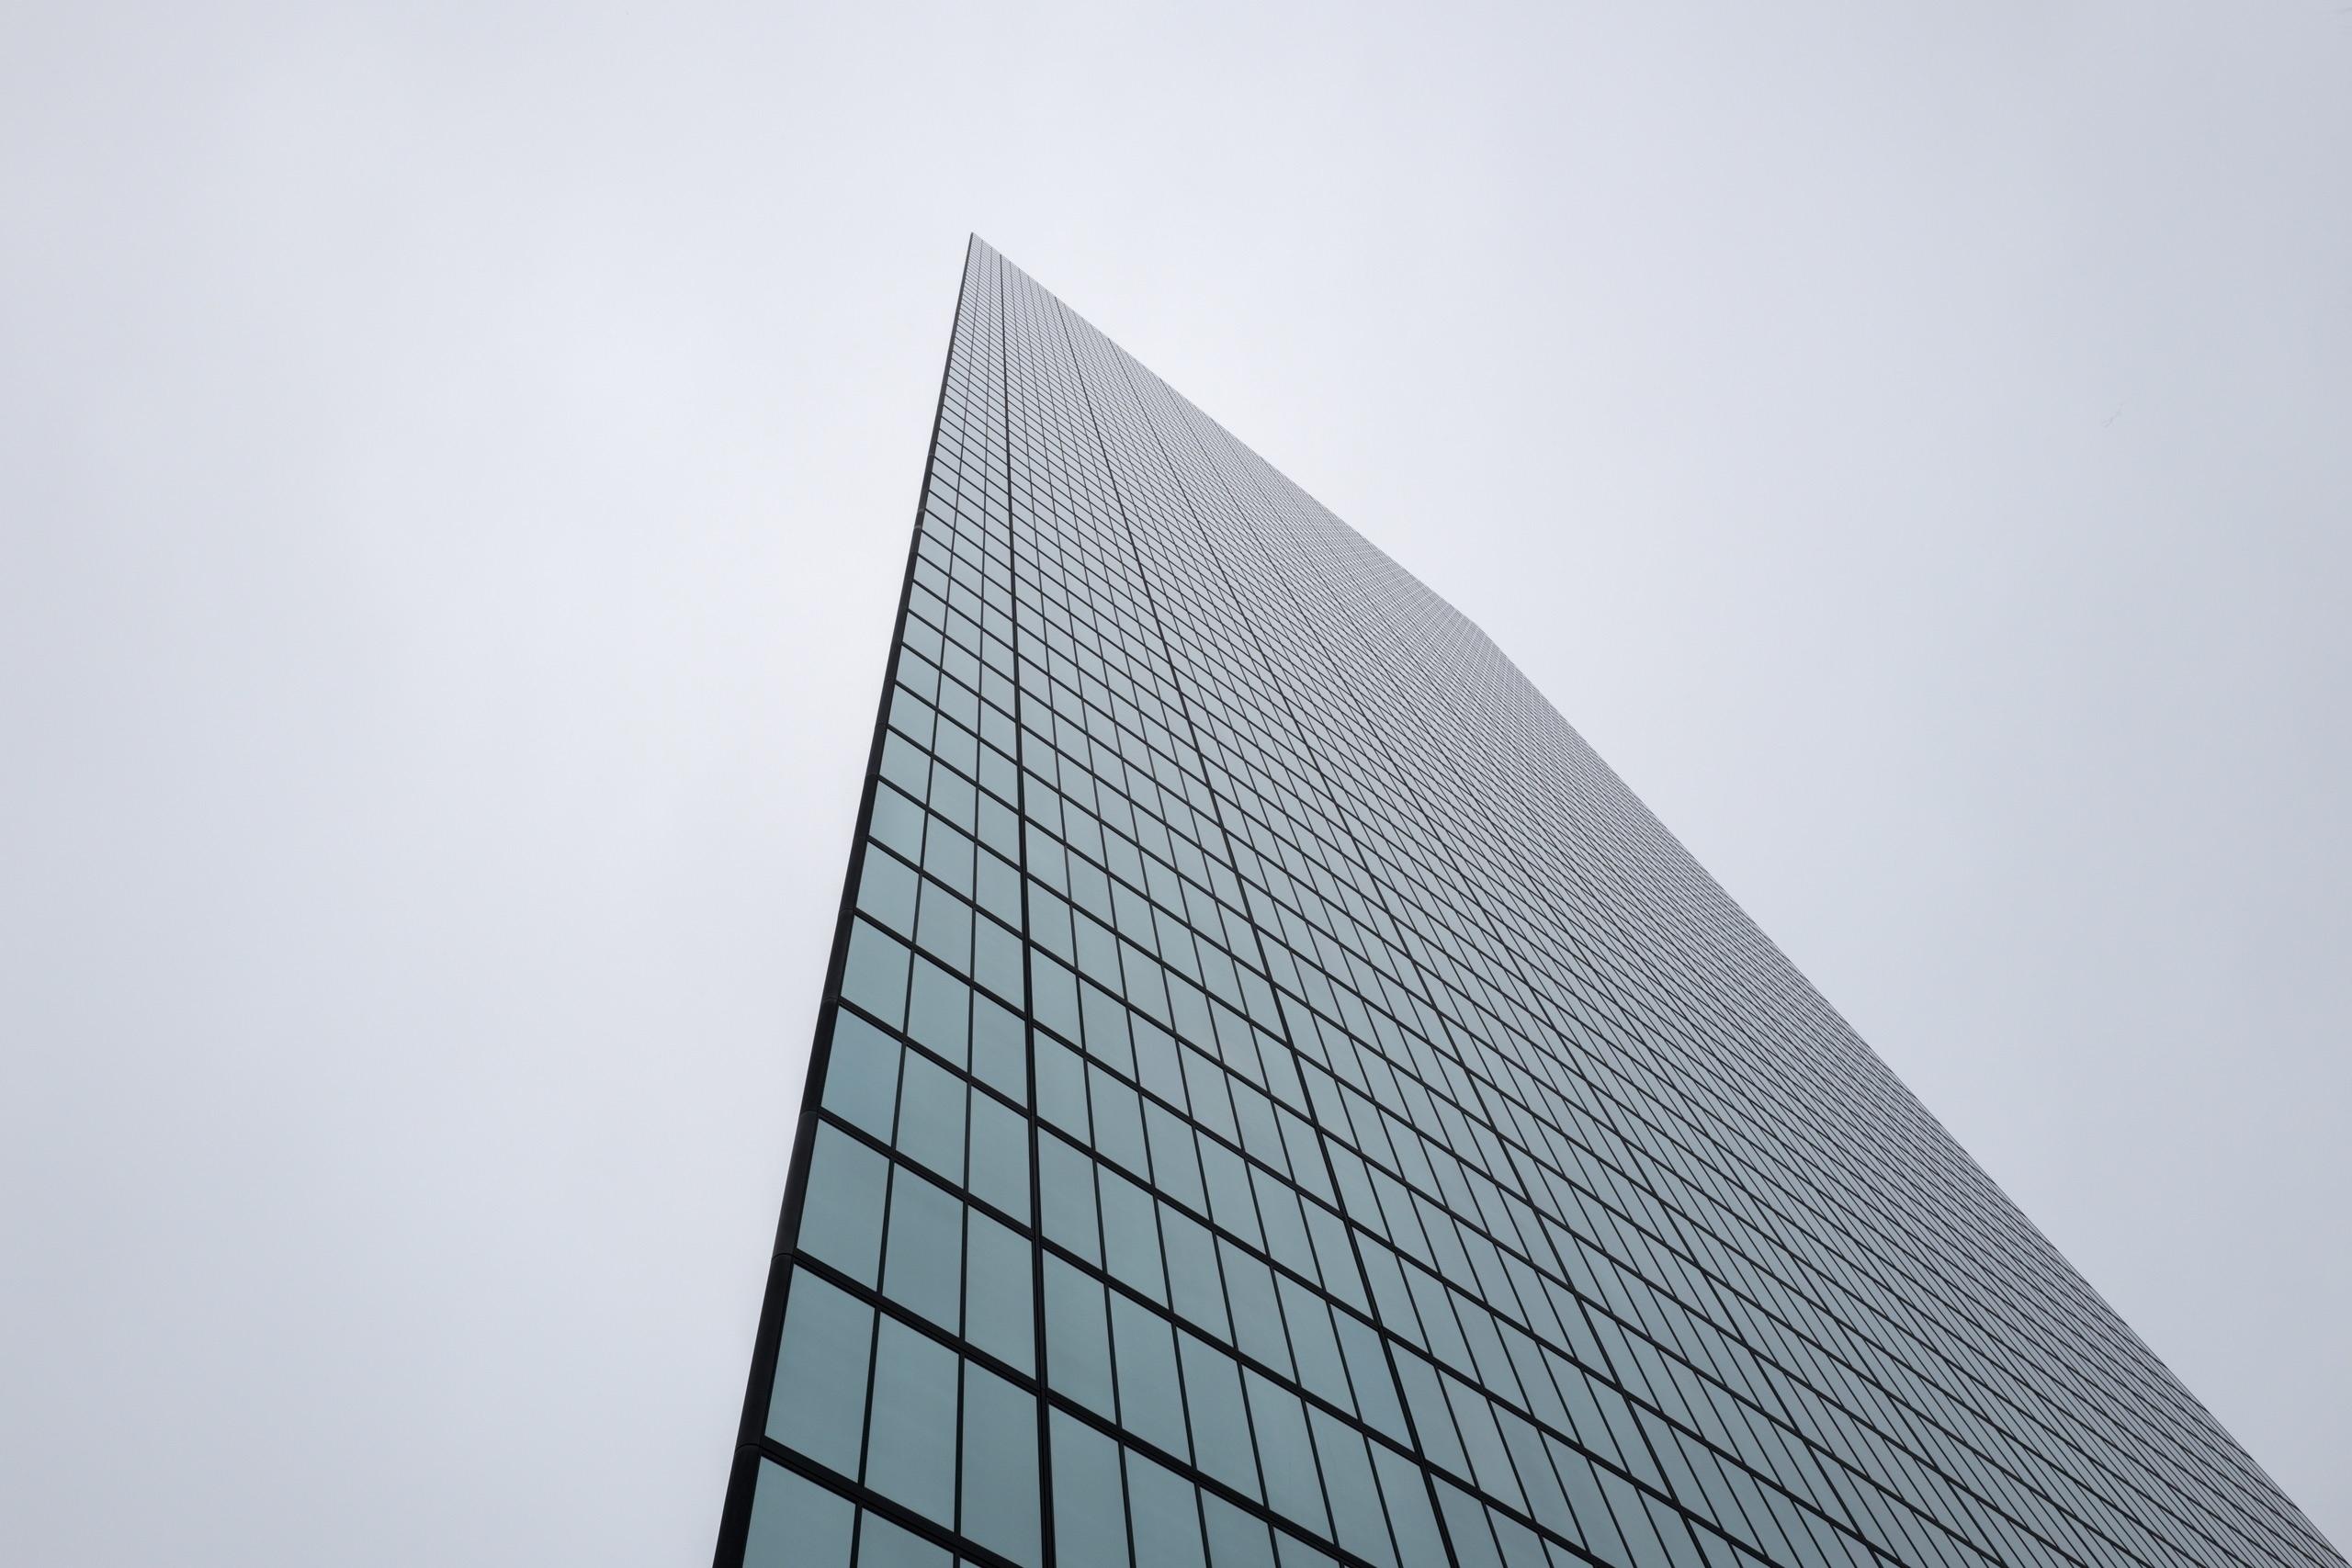 John Hancock Tower, Boston Arch - bostonphotographer | ello